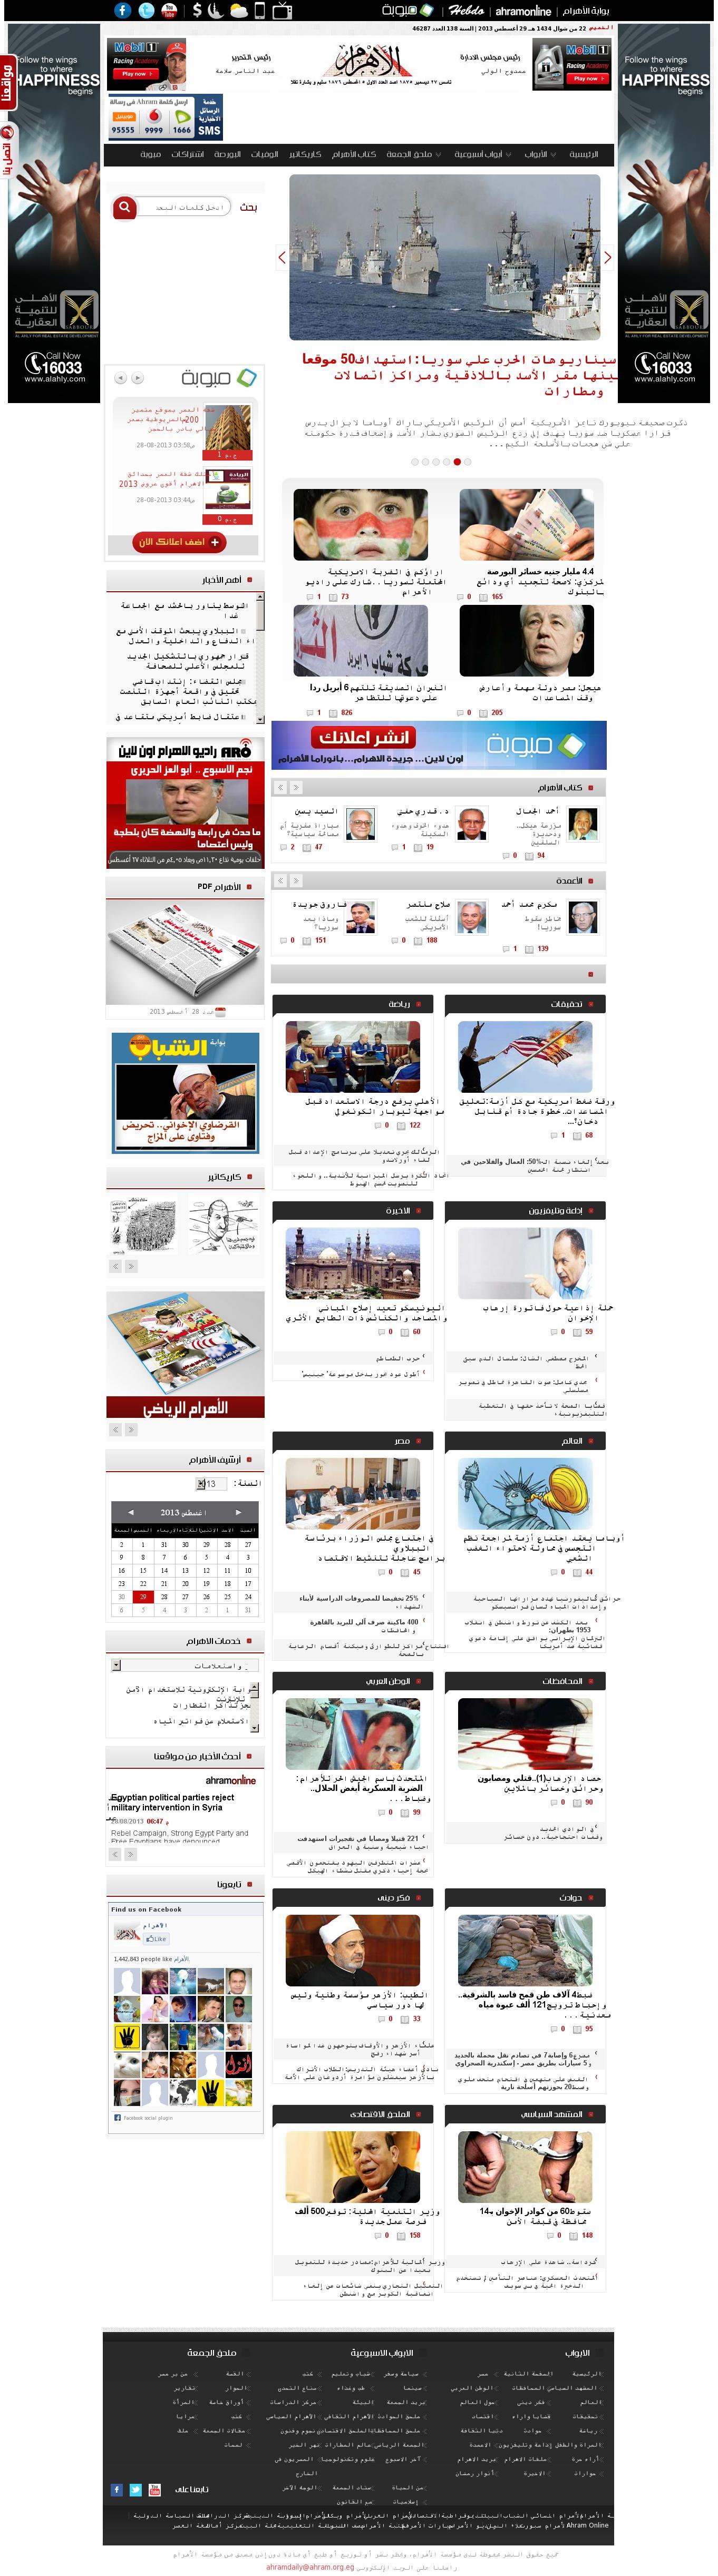 Al-Ahram at Wednesday Aug. 28, 2013, 11 p.m. UTC